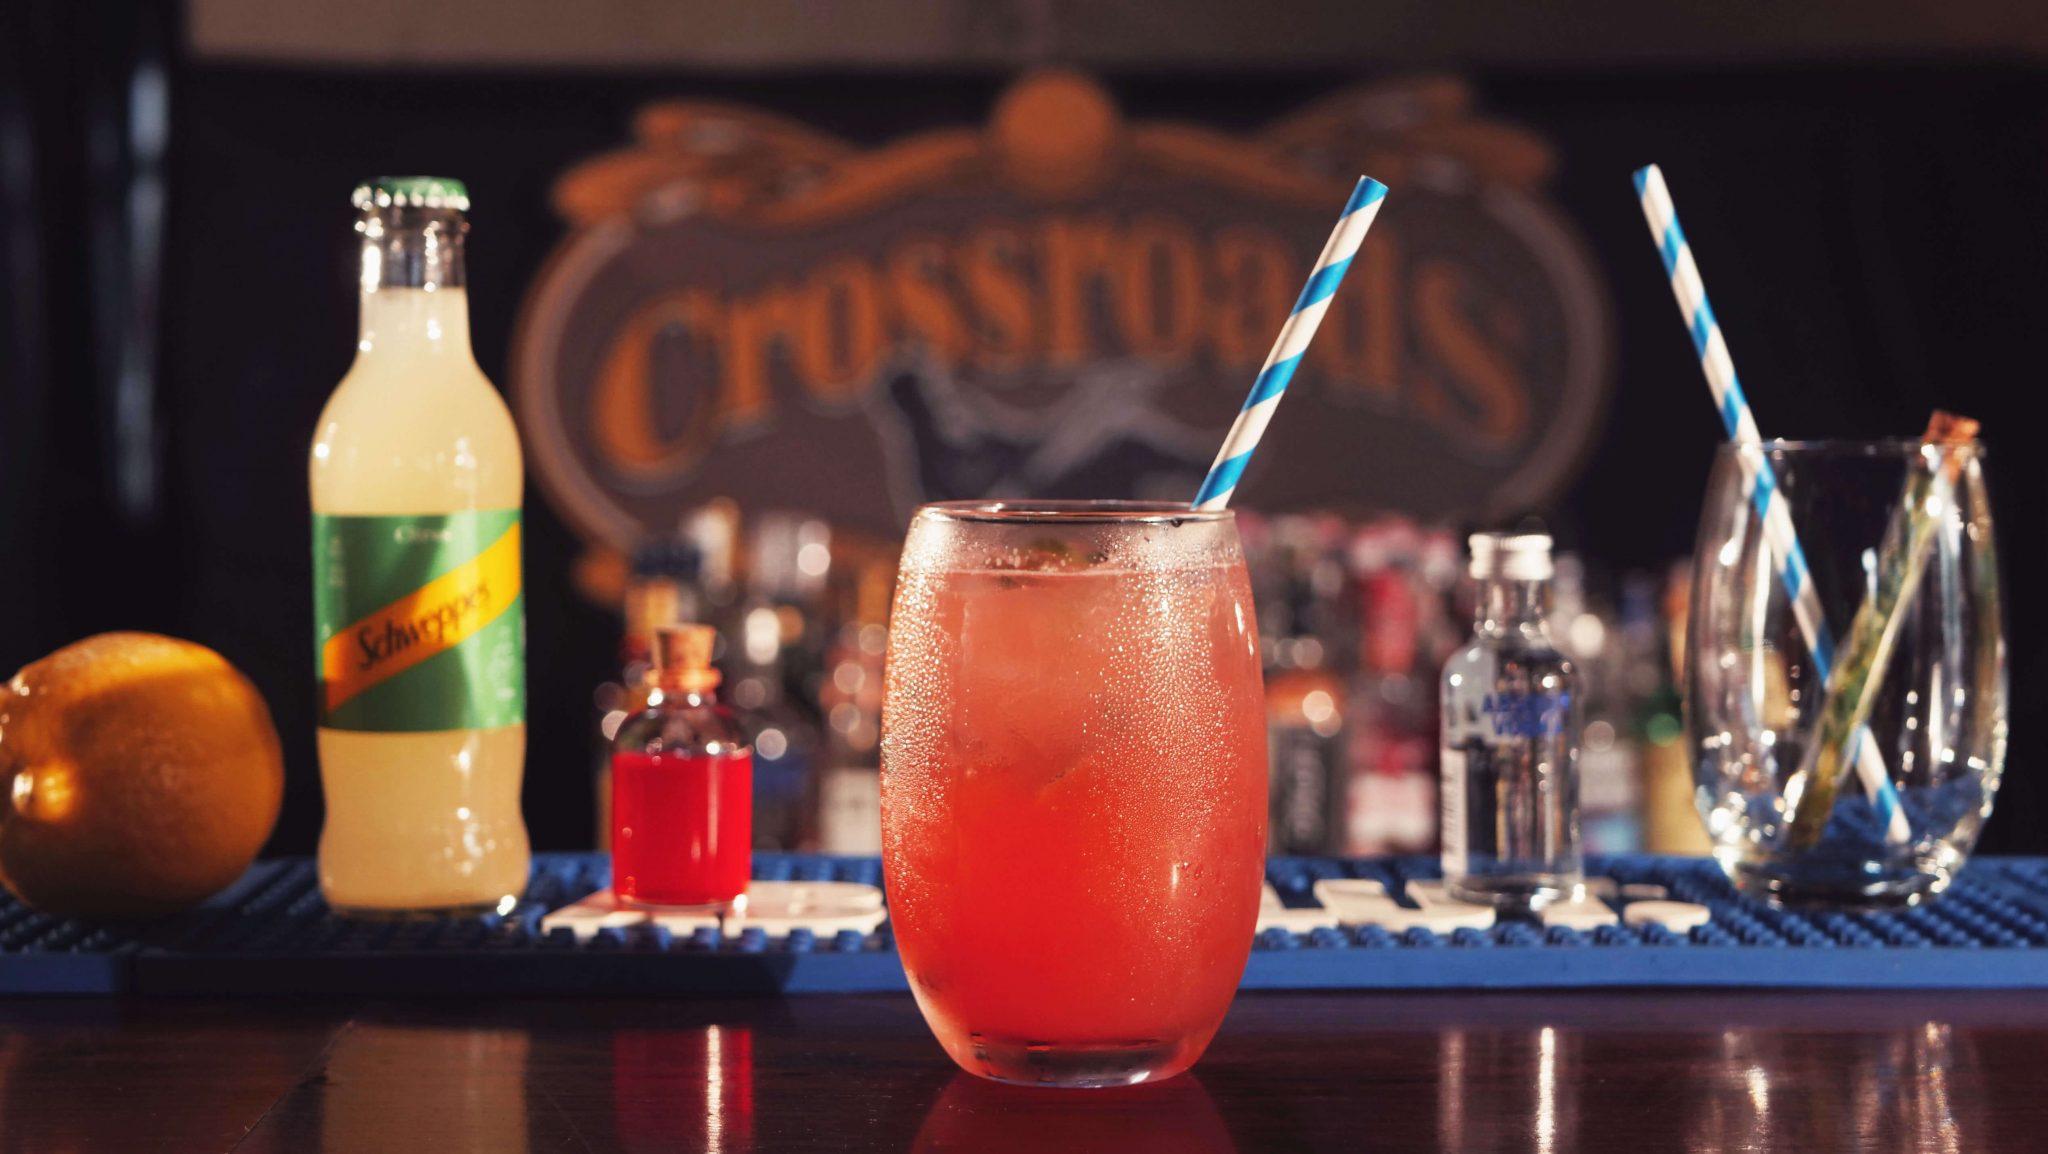 Bar Crossroads - Drink Absolut Shaddock Citrus - Cred João Vitor Miguel (1)